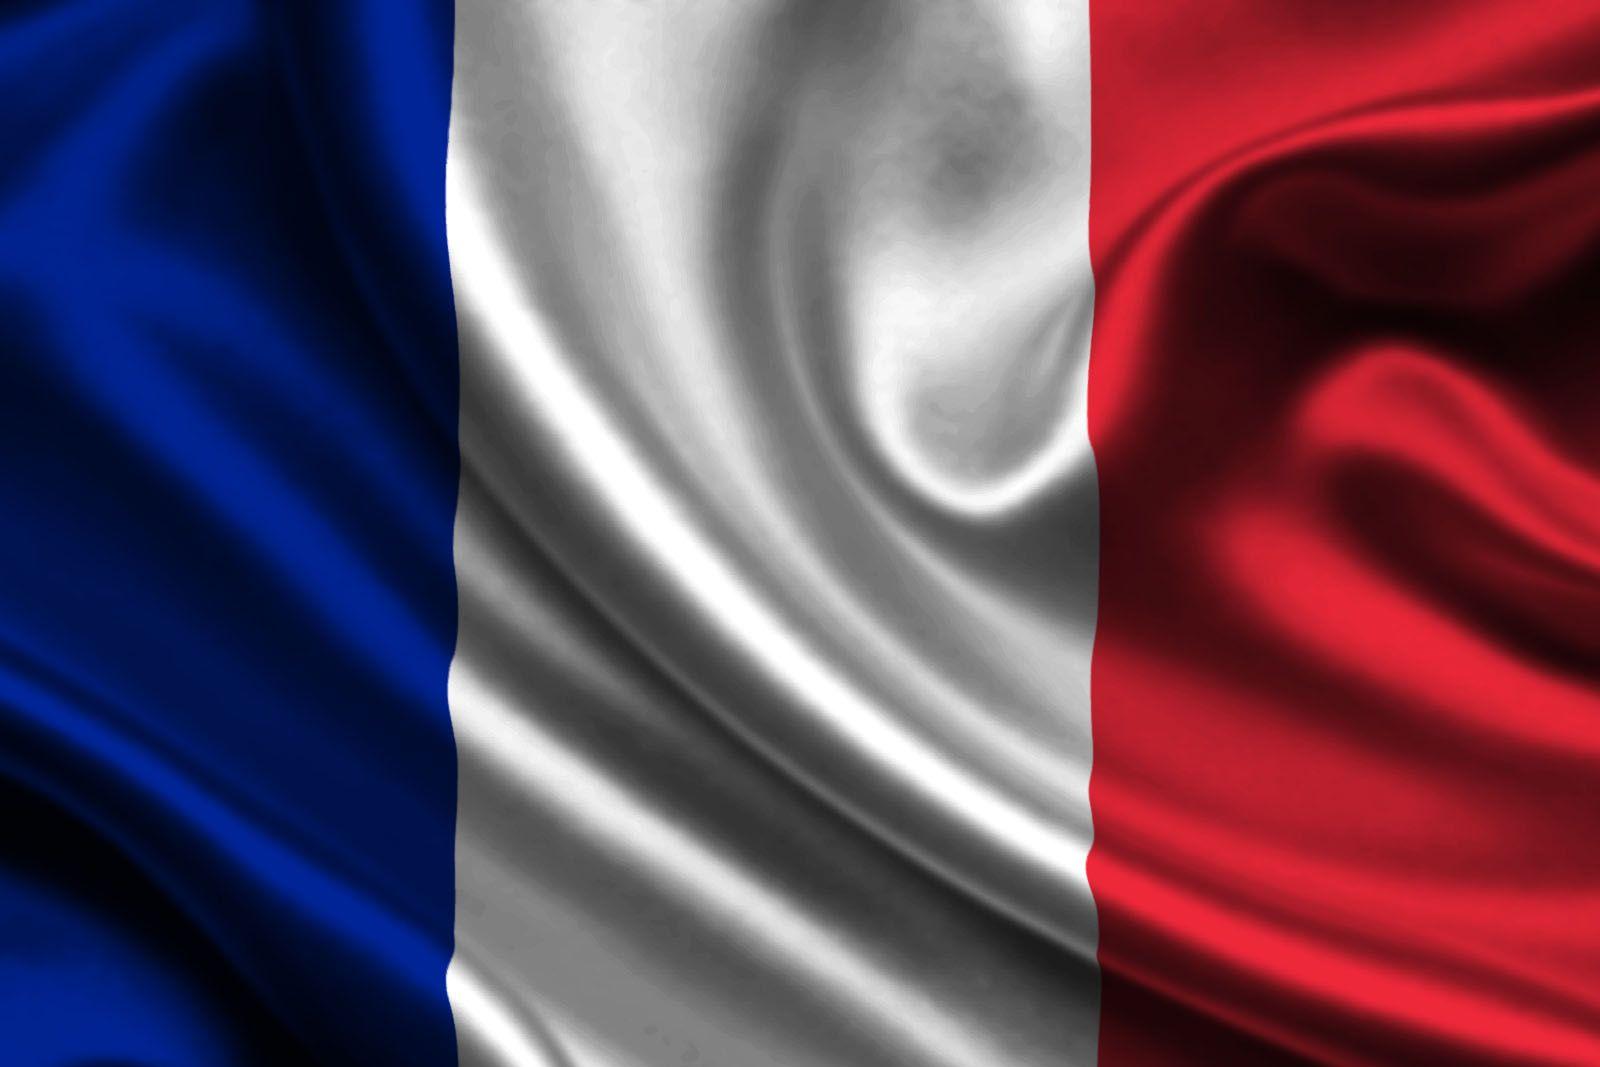 دپارتمان فرانسه